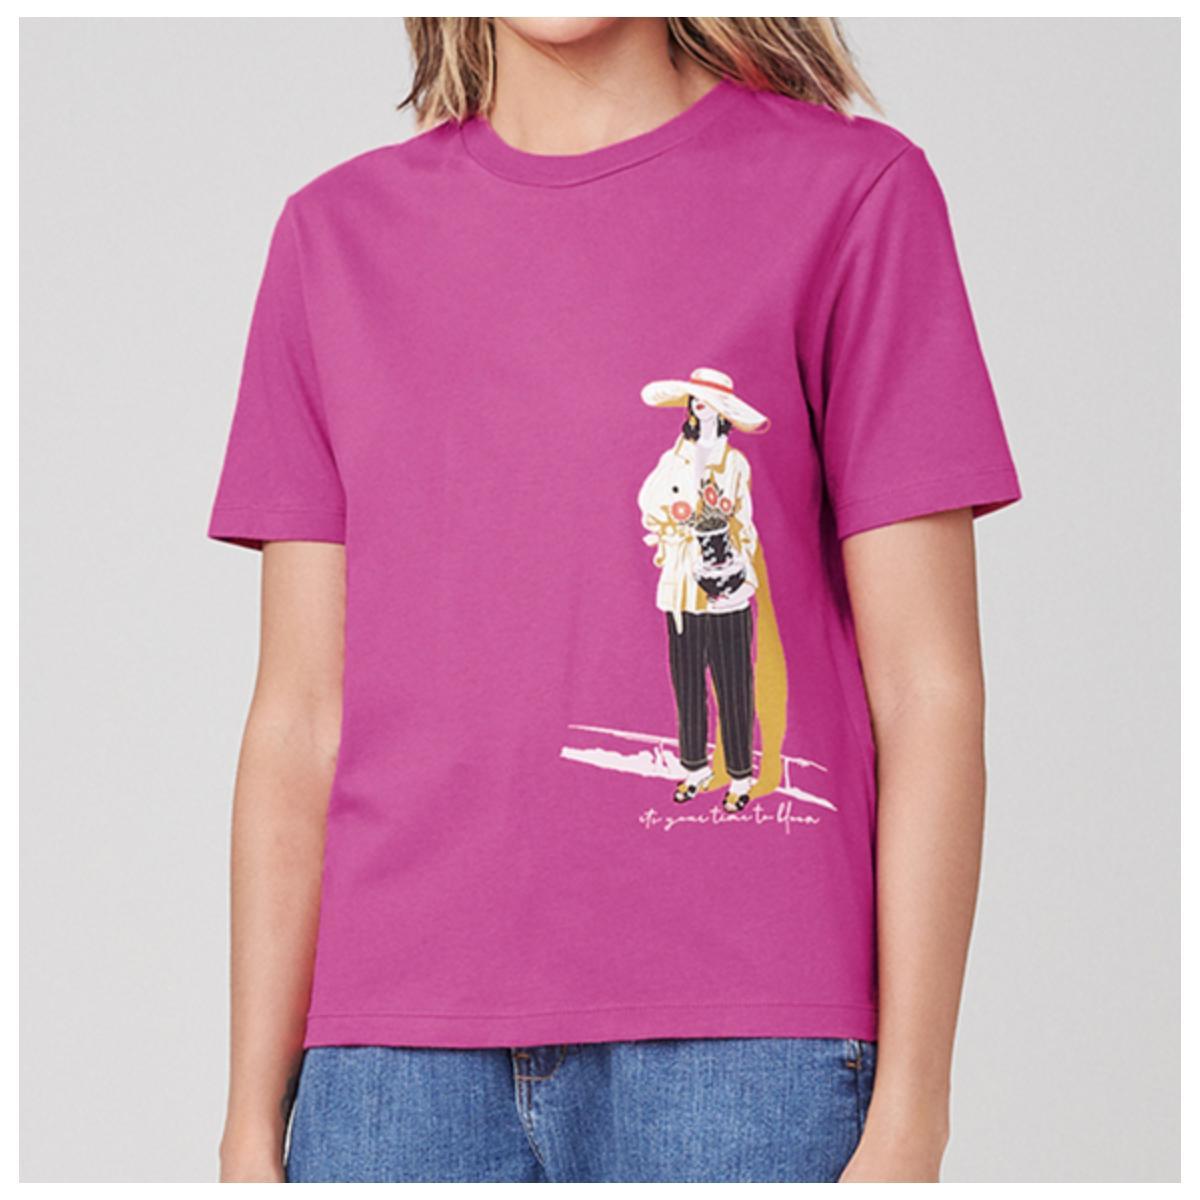 T-shirt Feminino Dzarm 6rz3 Kquen Pink